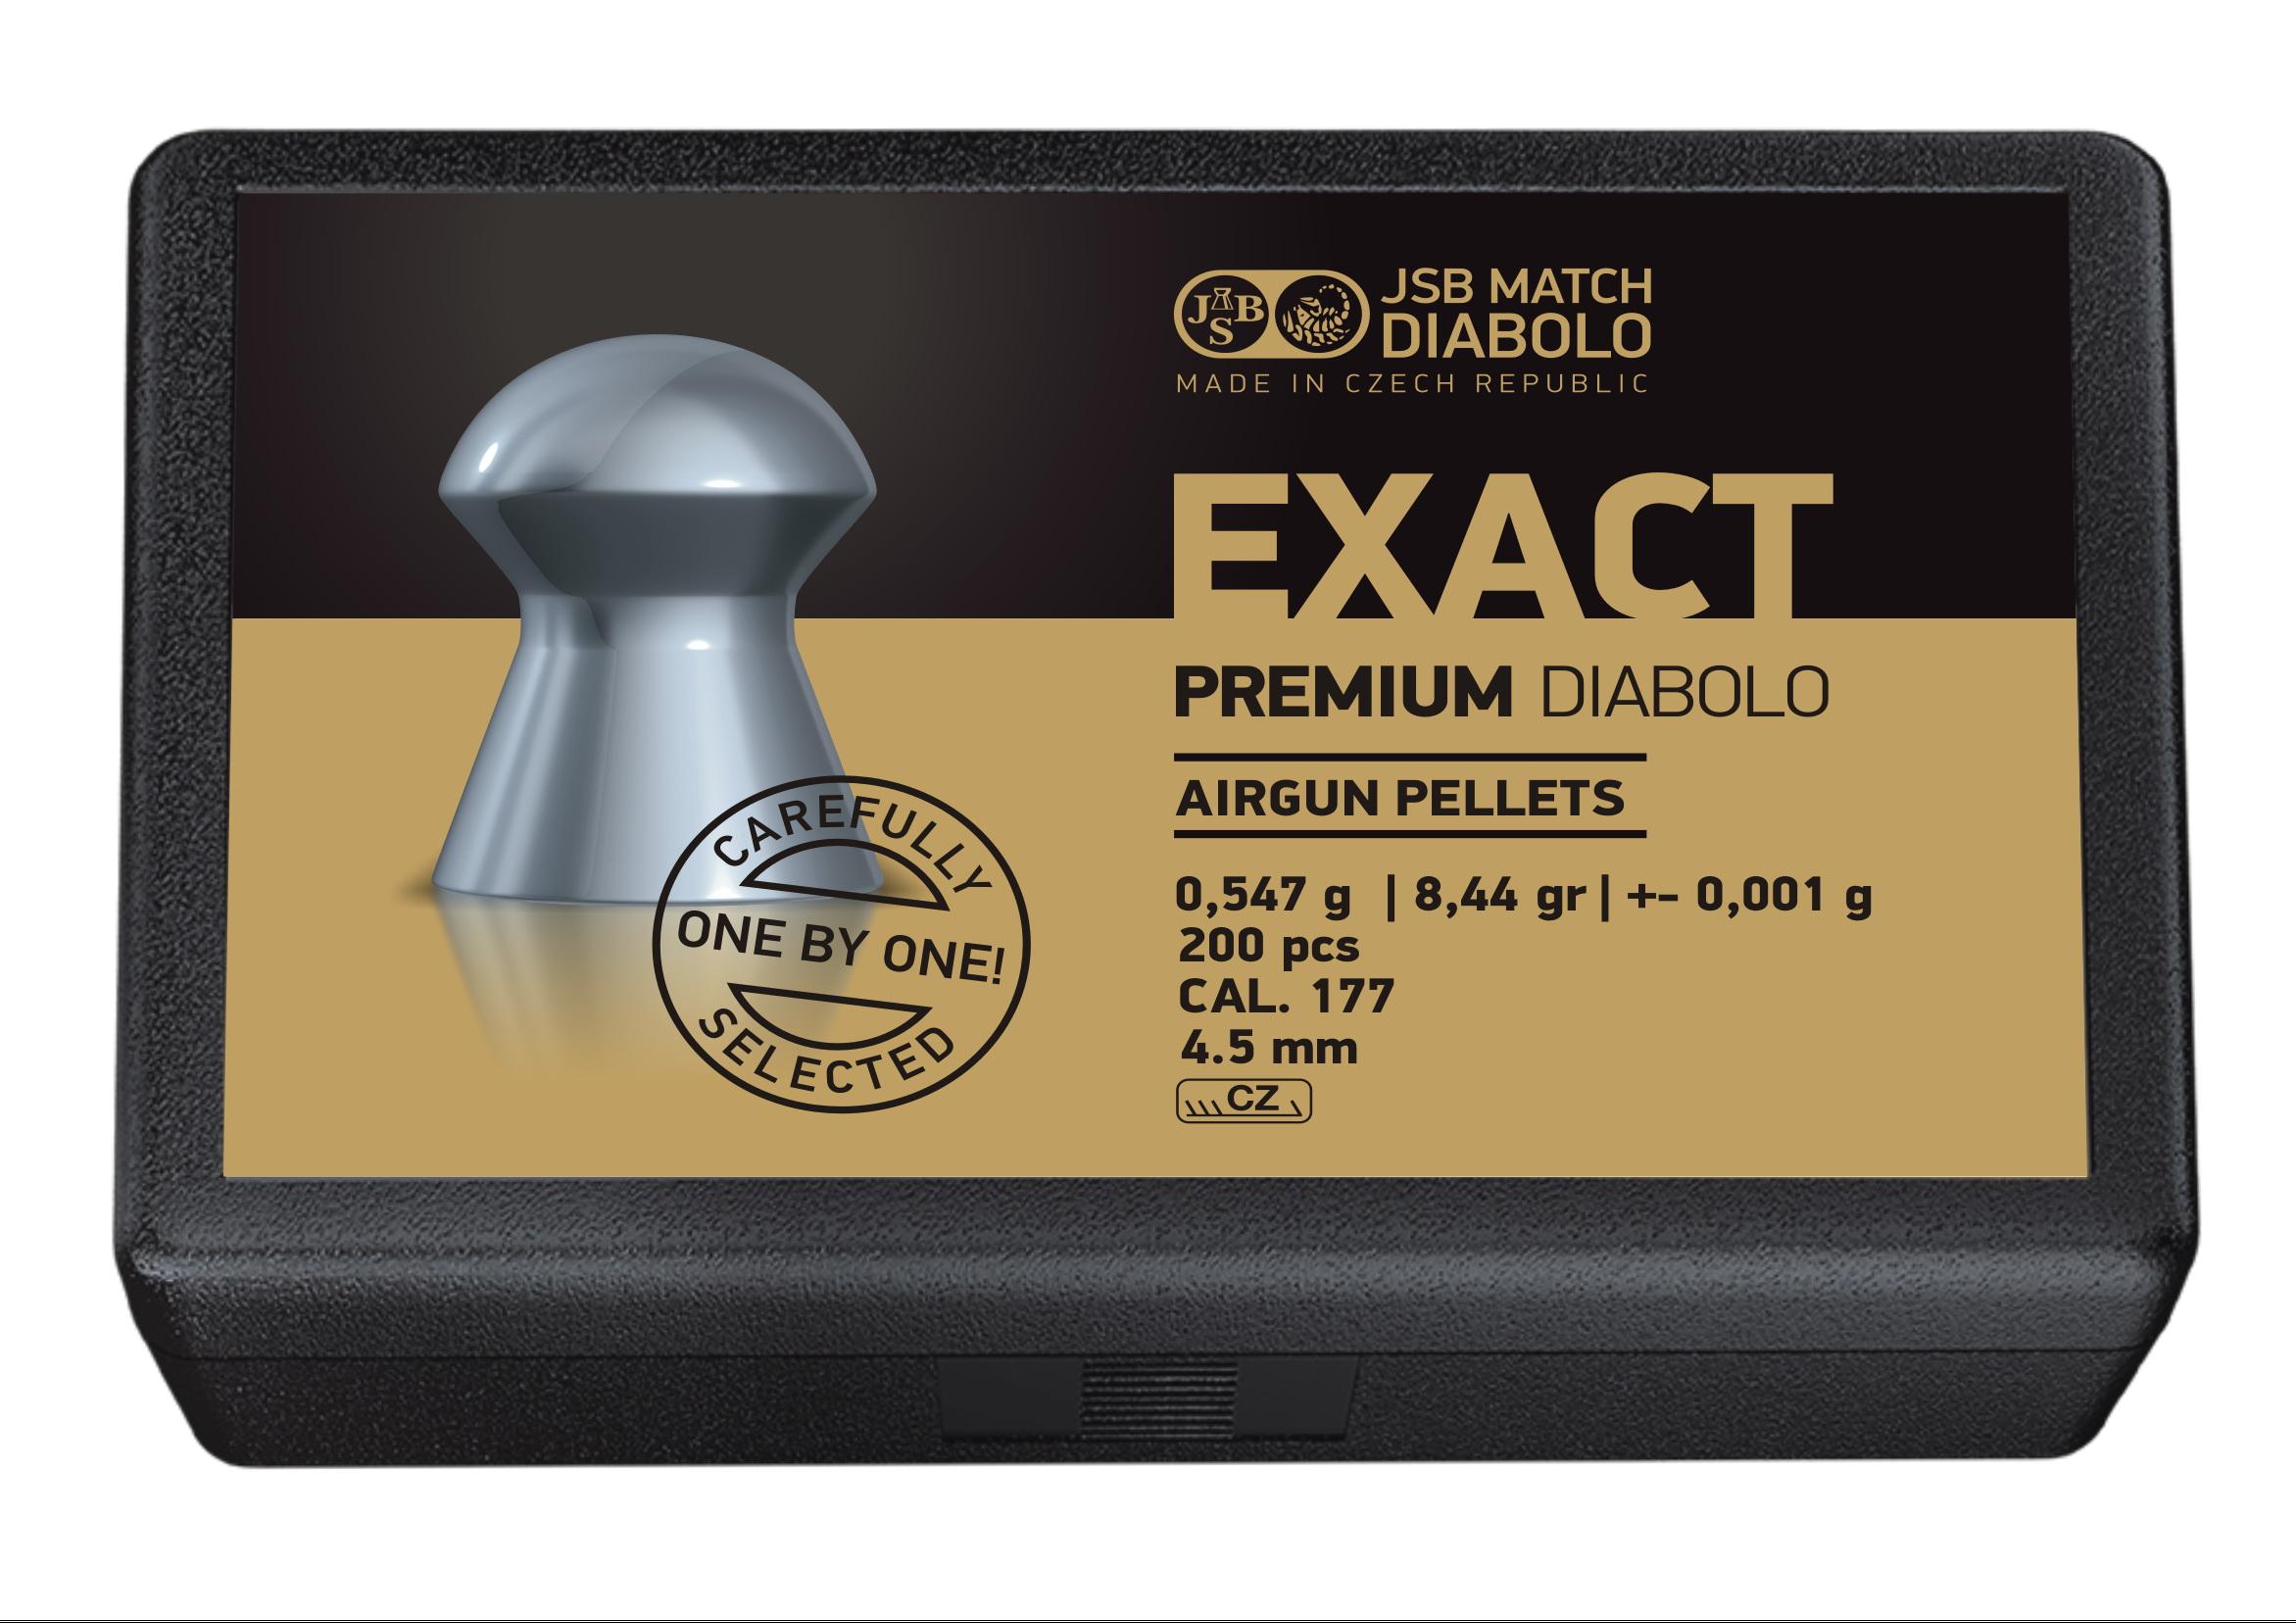 JSB Exact Premium Diabolo .177 (4.52mm)